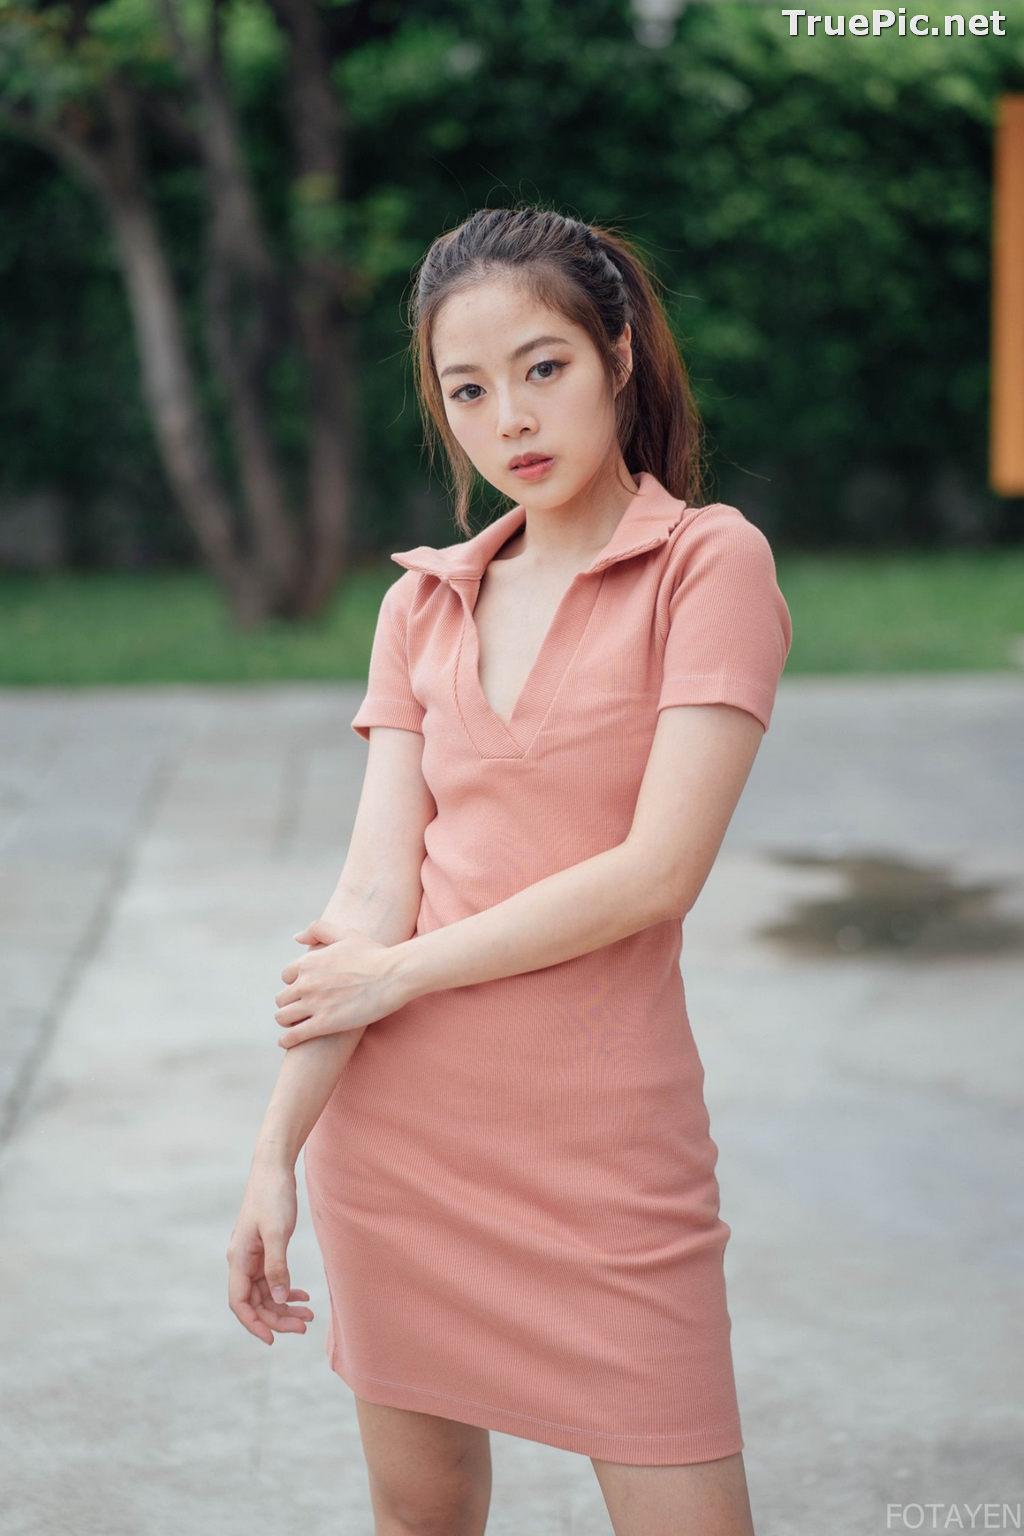 Image Thailand Model - Chanitar Sophawatanon - Pink Lady - TruePic.net - Picture-9